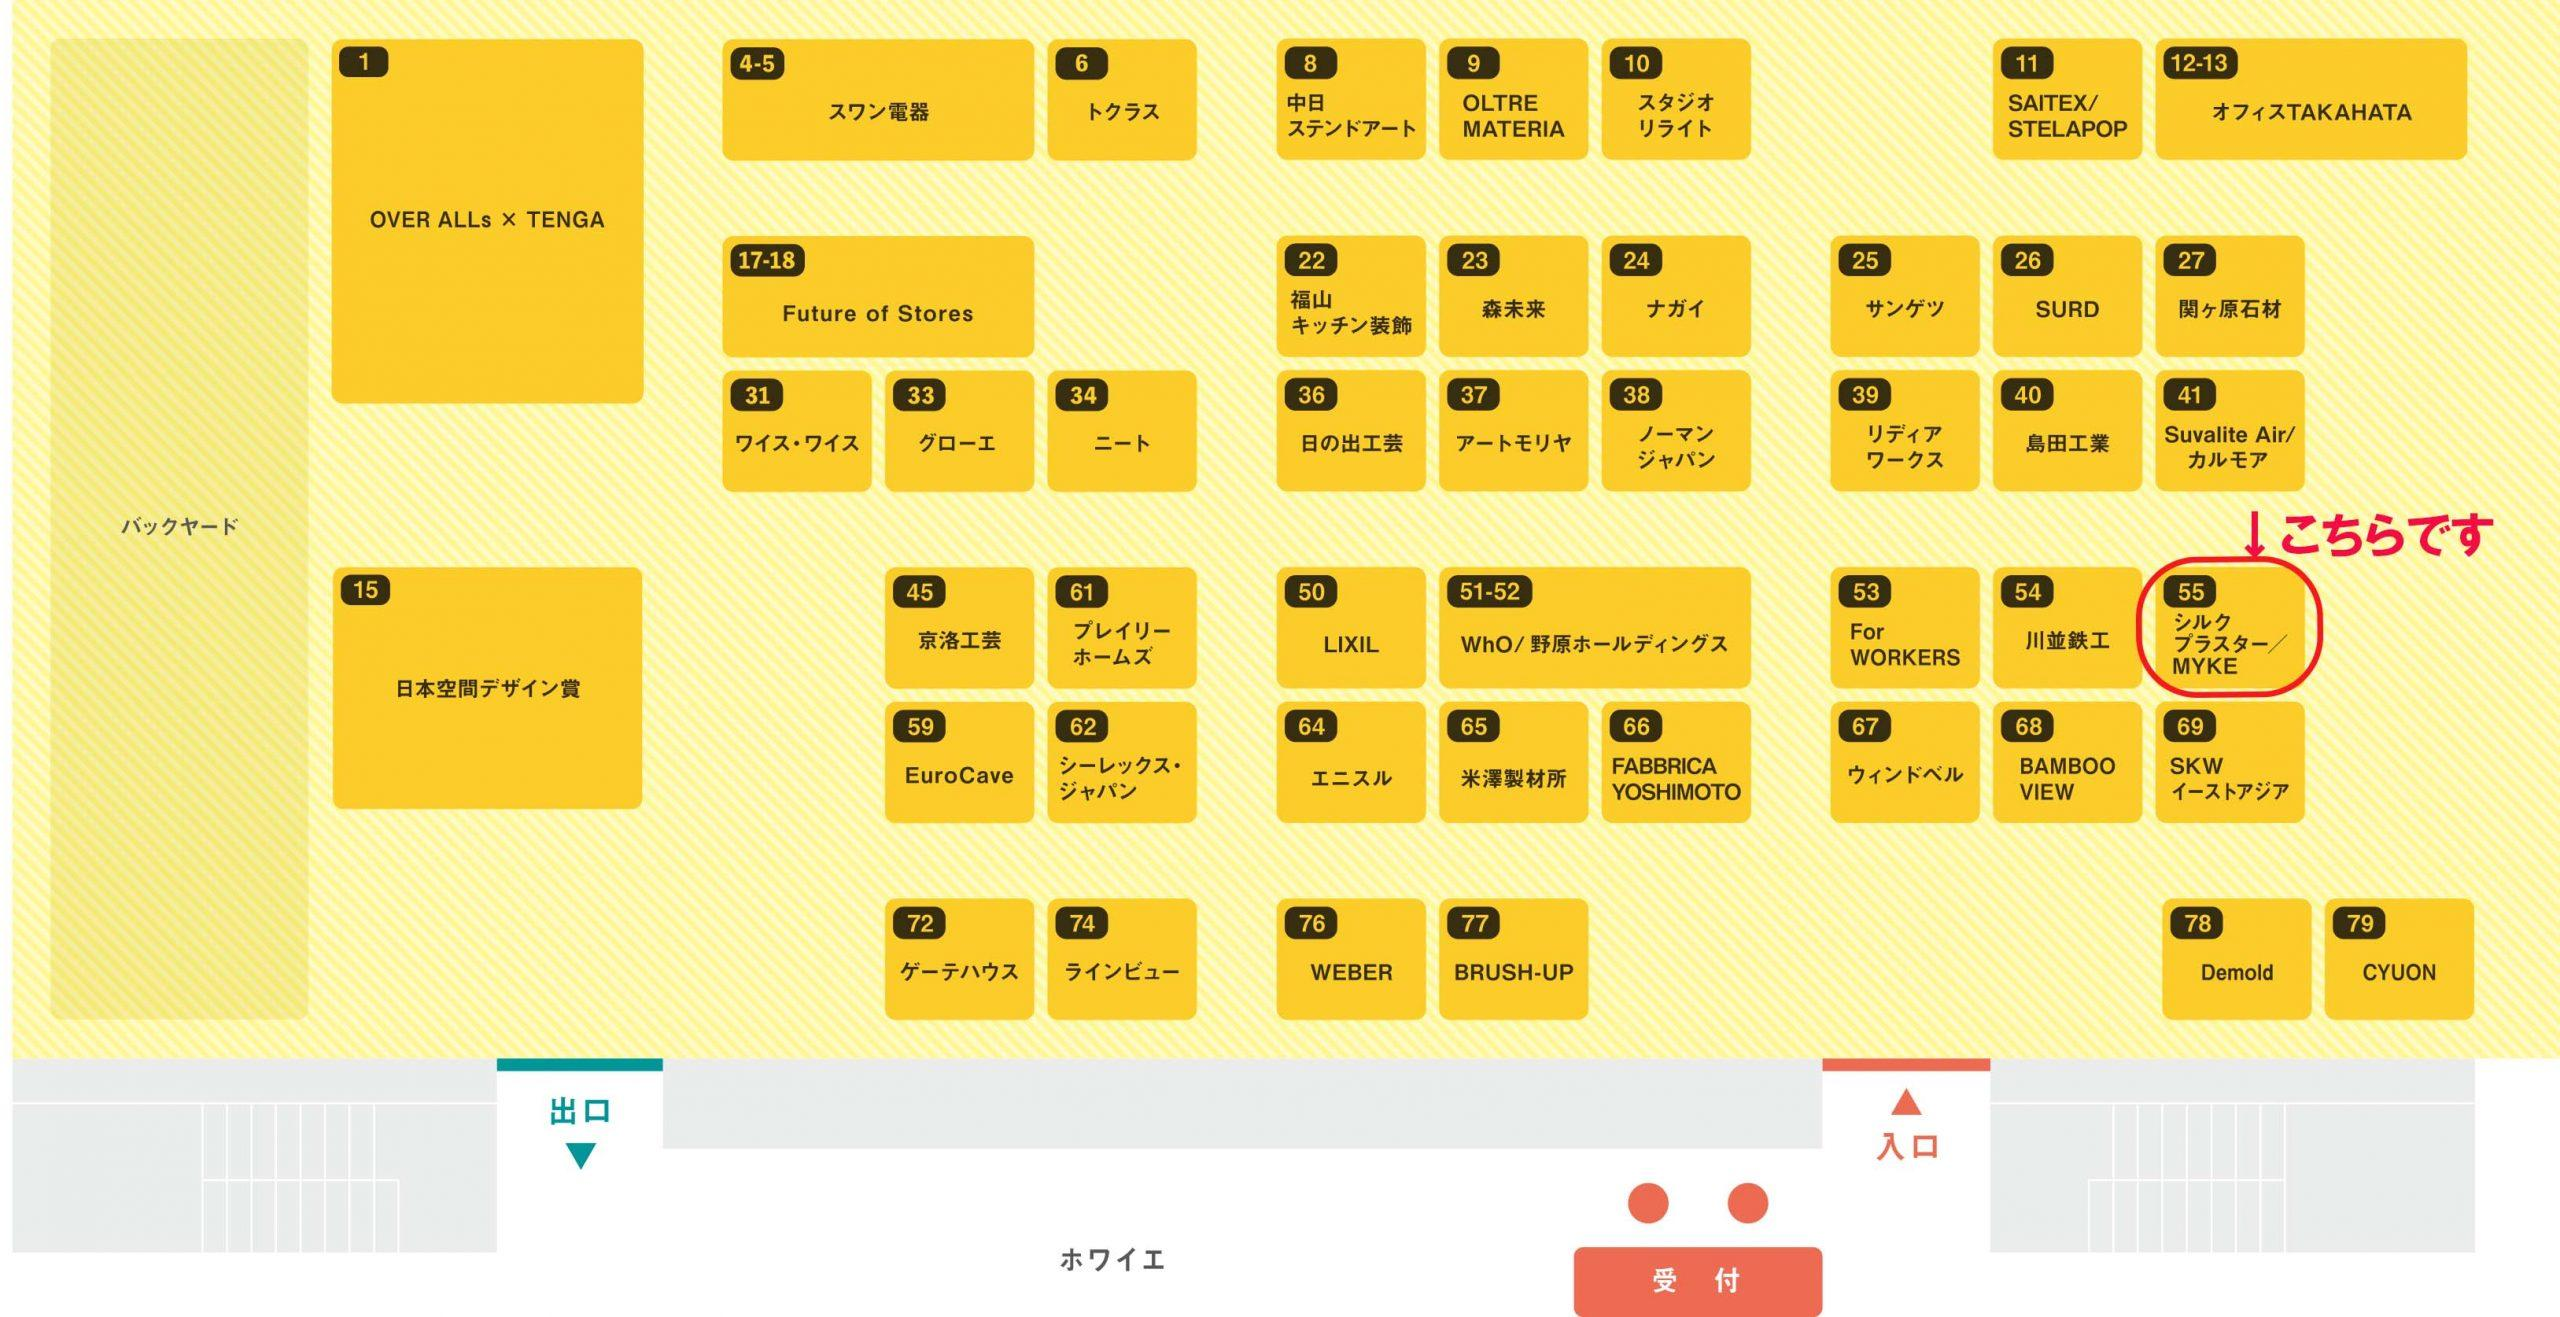 BAMBOO-EXPO-15-layout-scaled.jpg